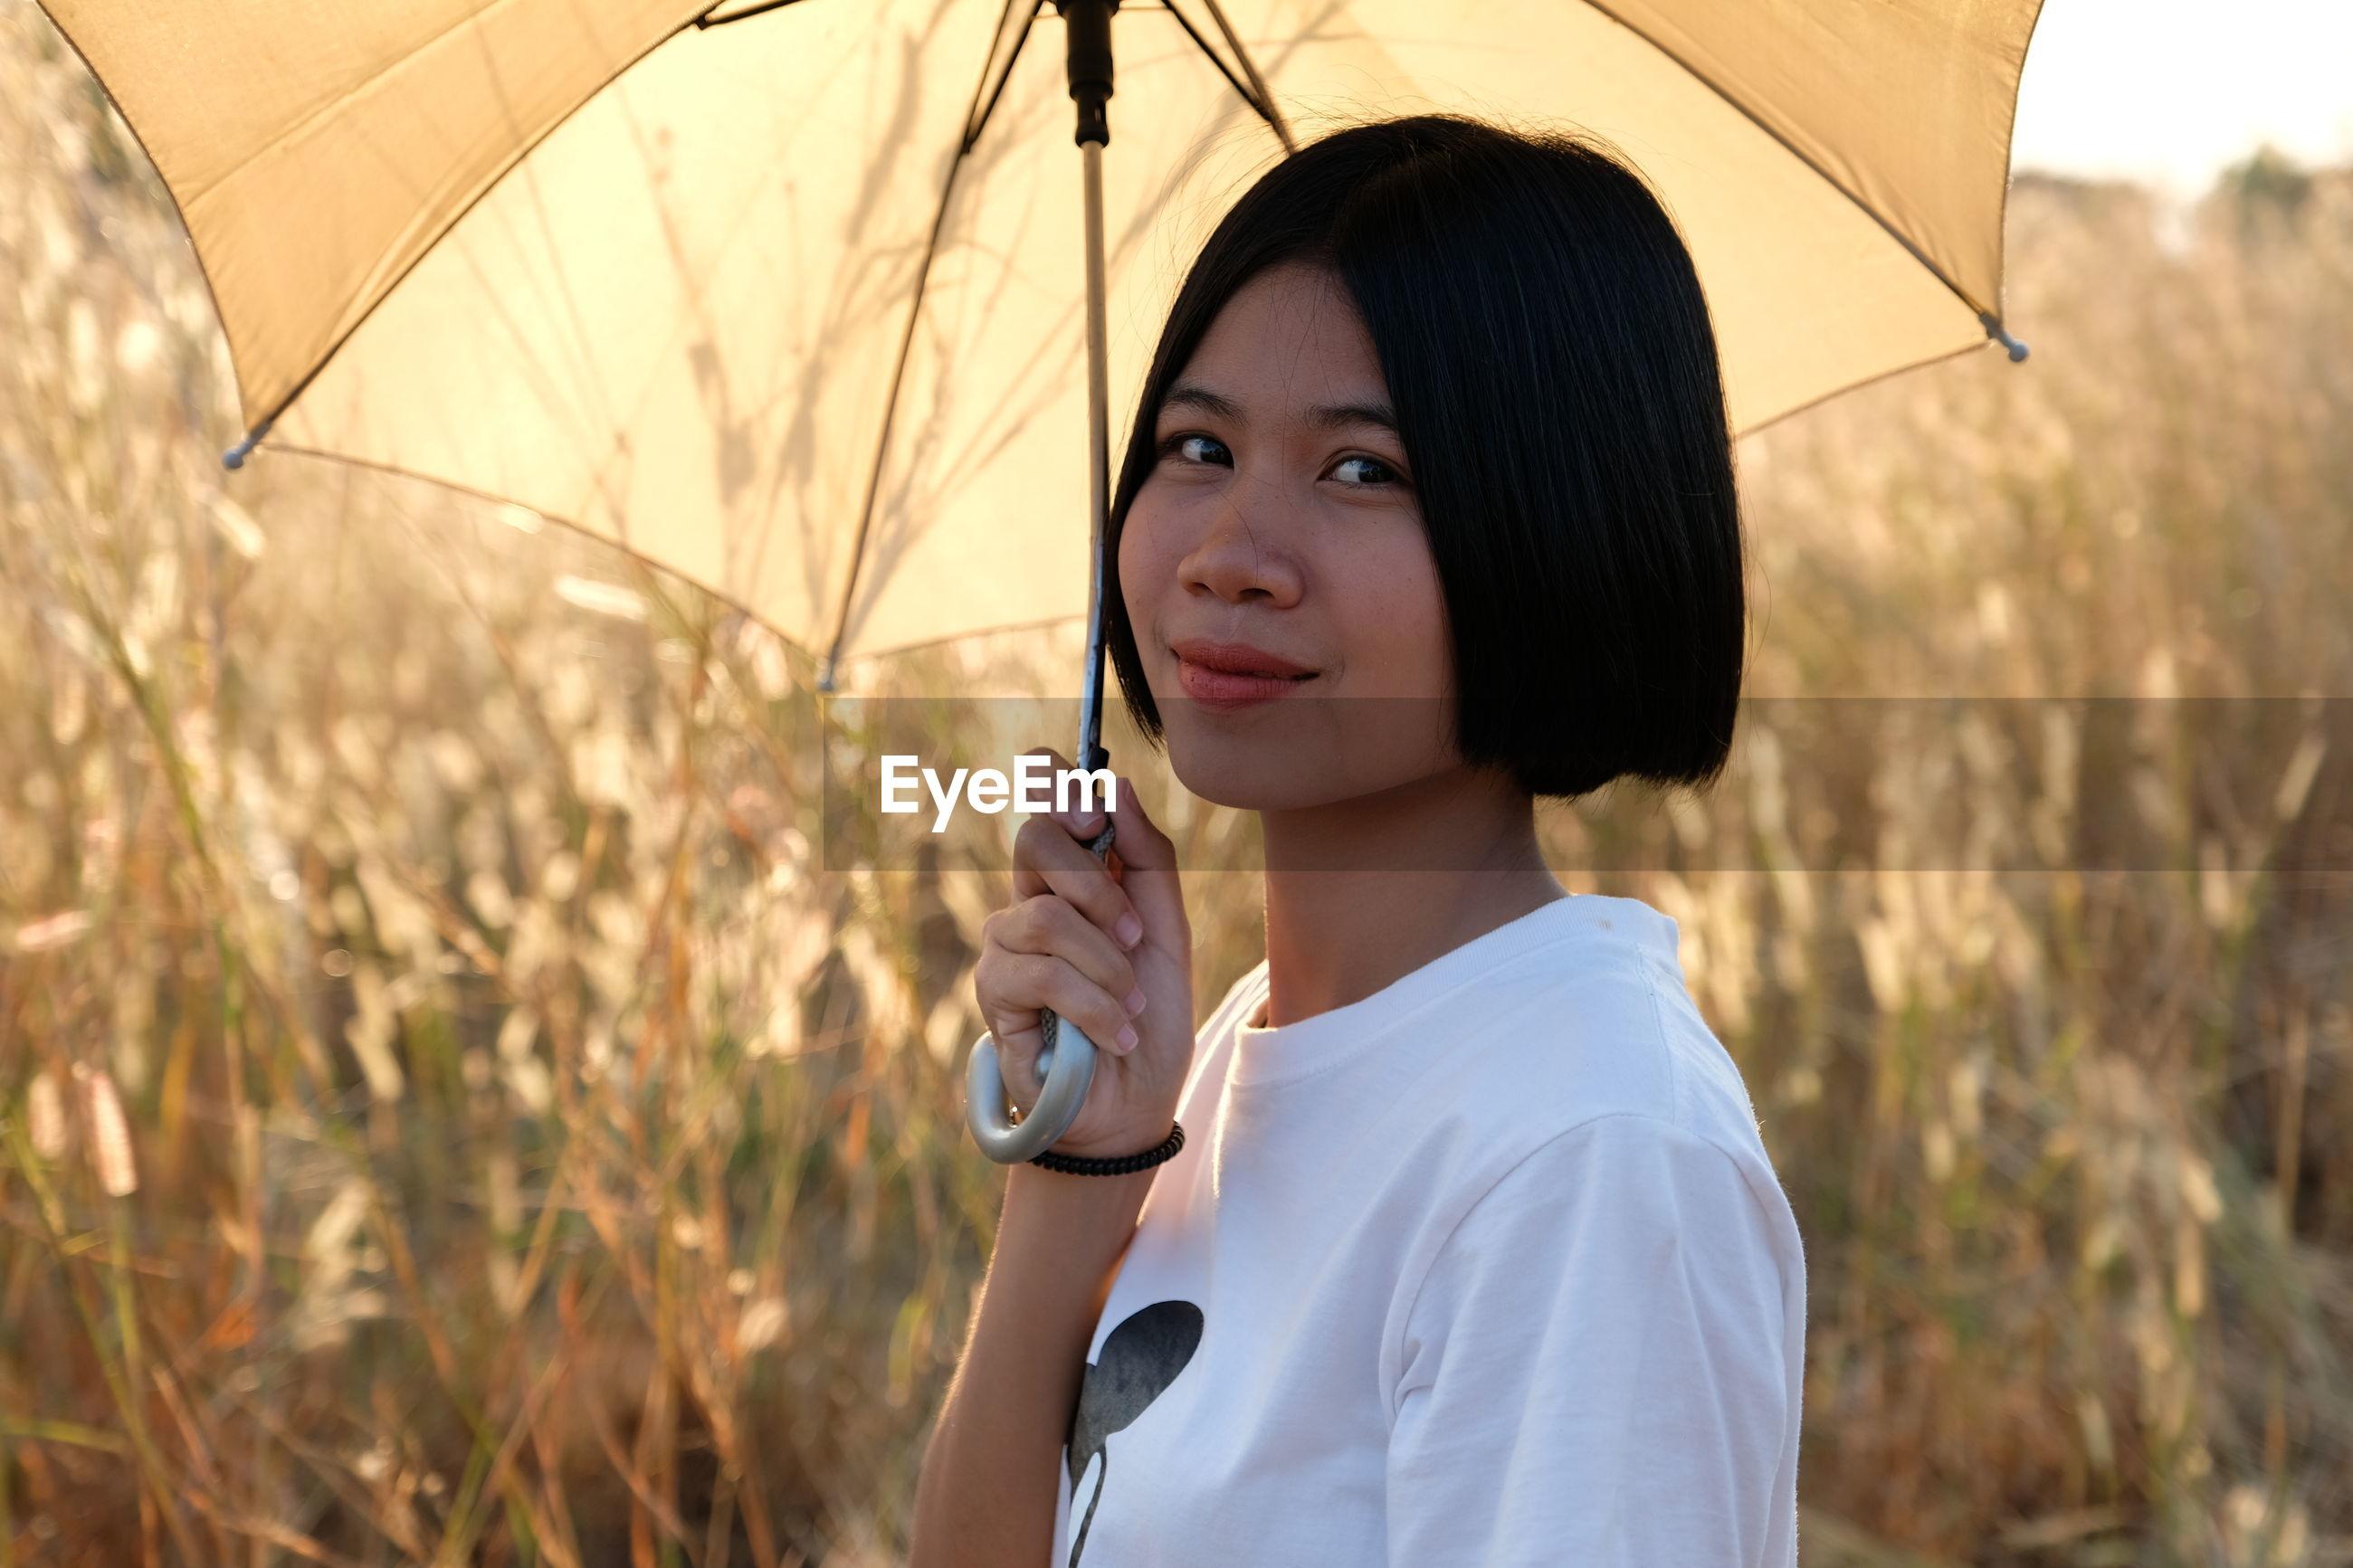 Portrait of woman holding umbrella against plants